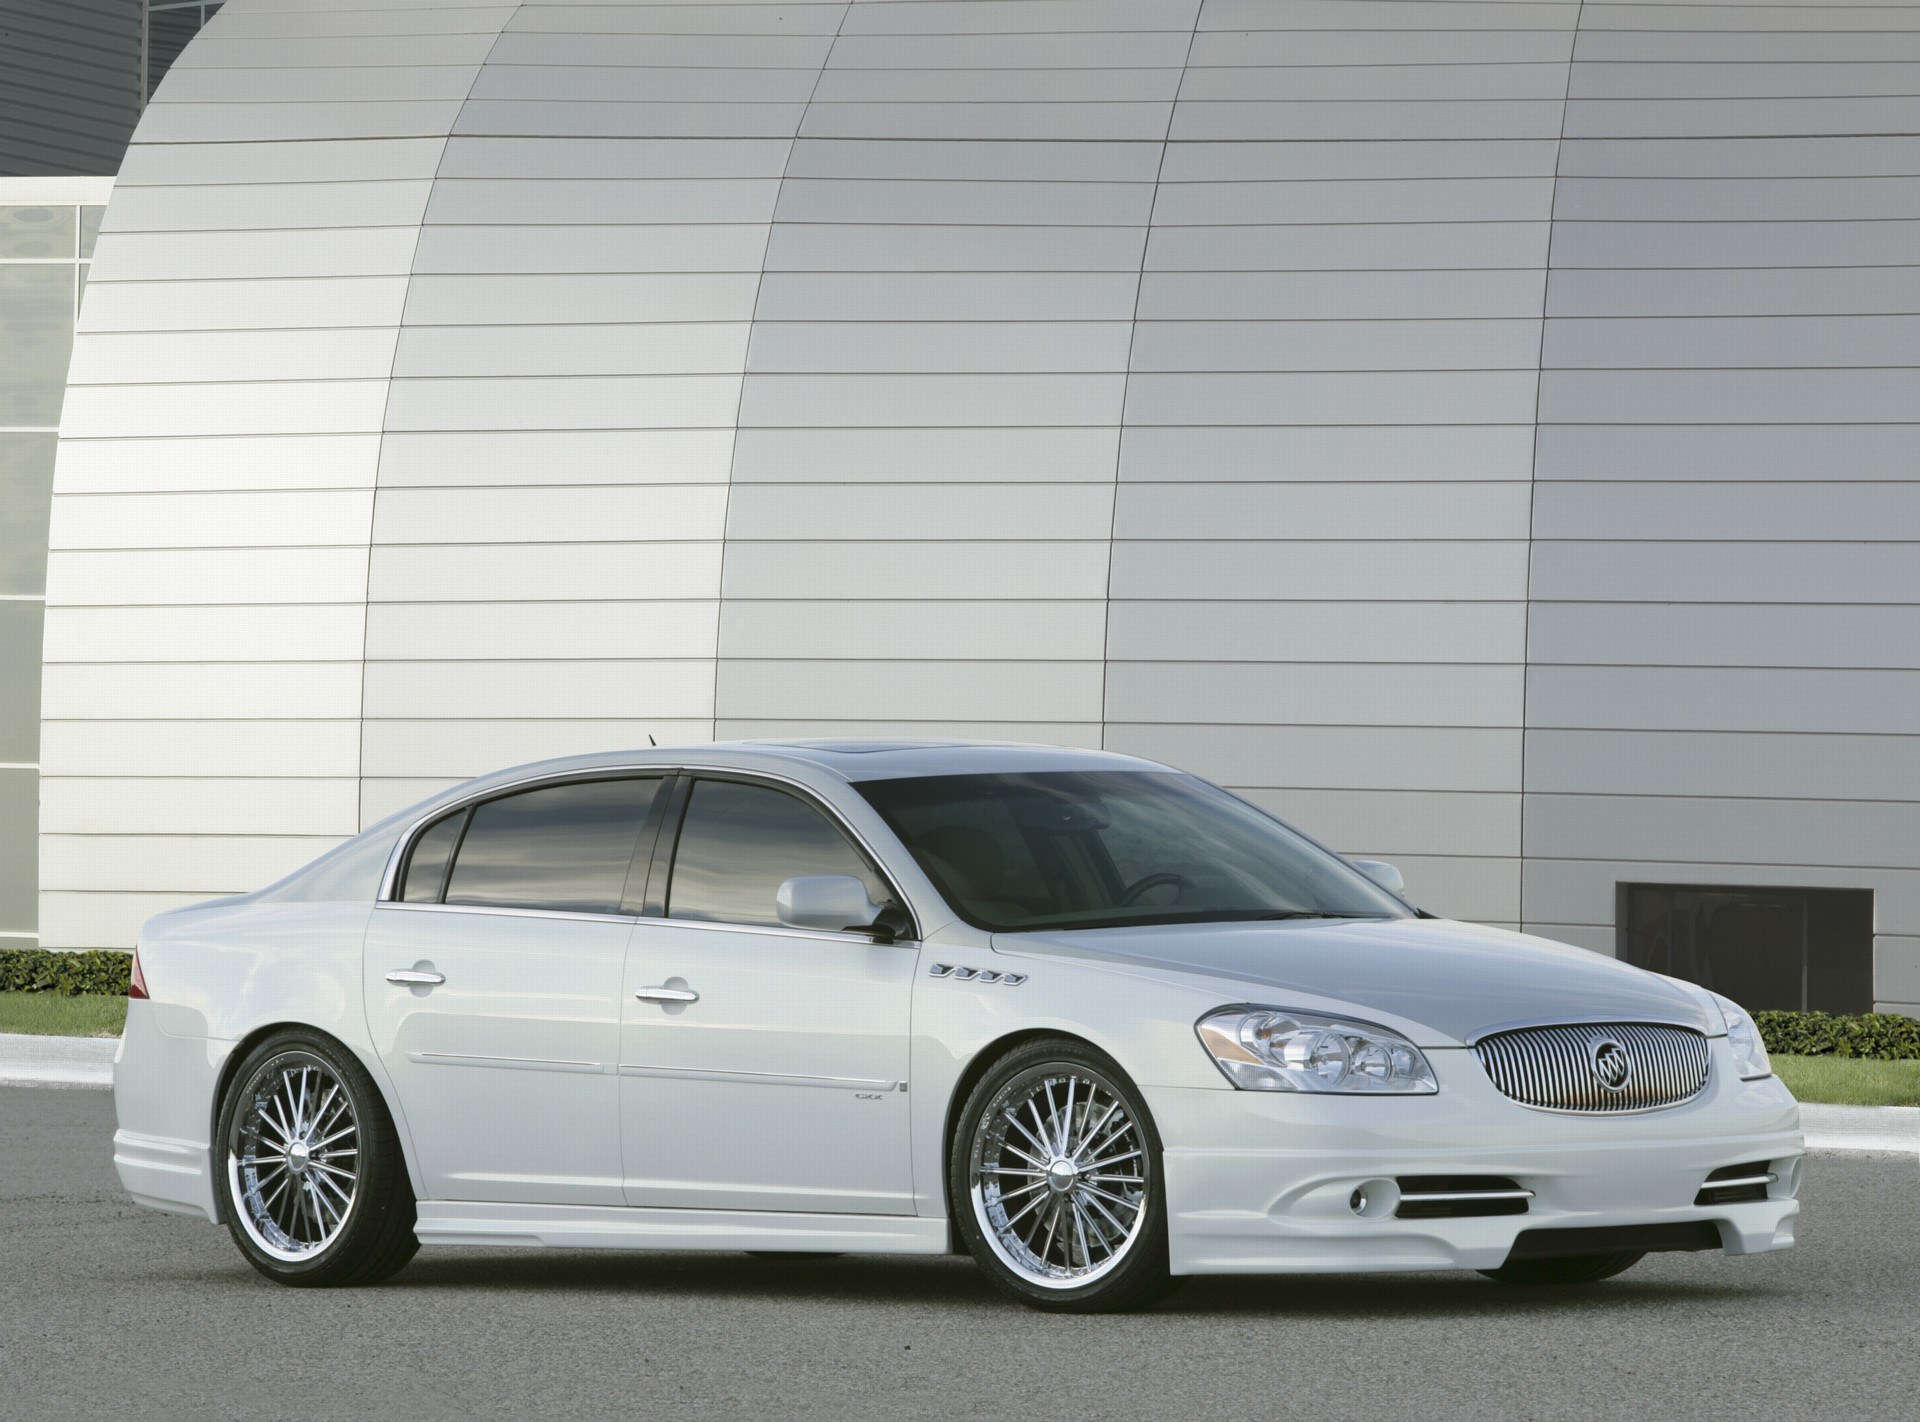 2006 Buick Lucerne CXX Luxury Liner | conceptcarz.com